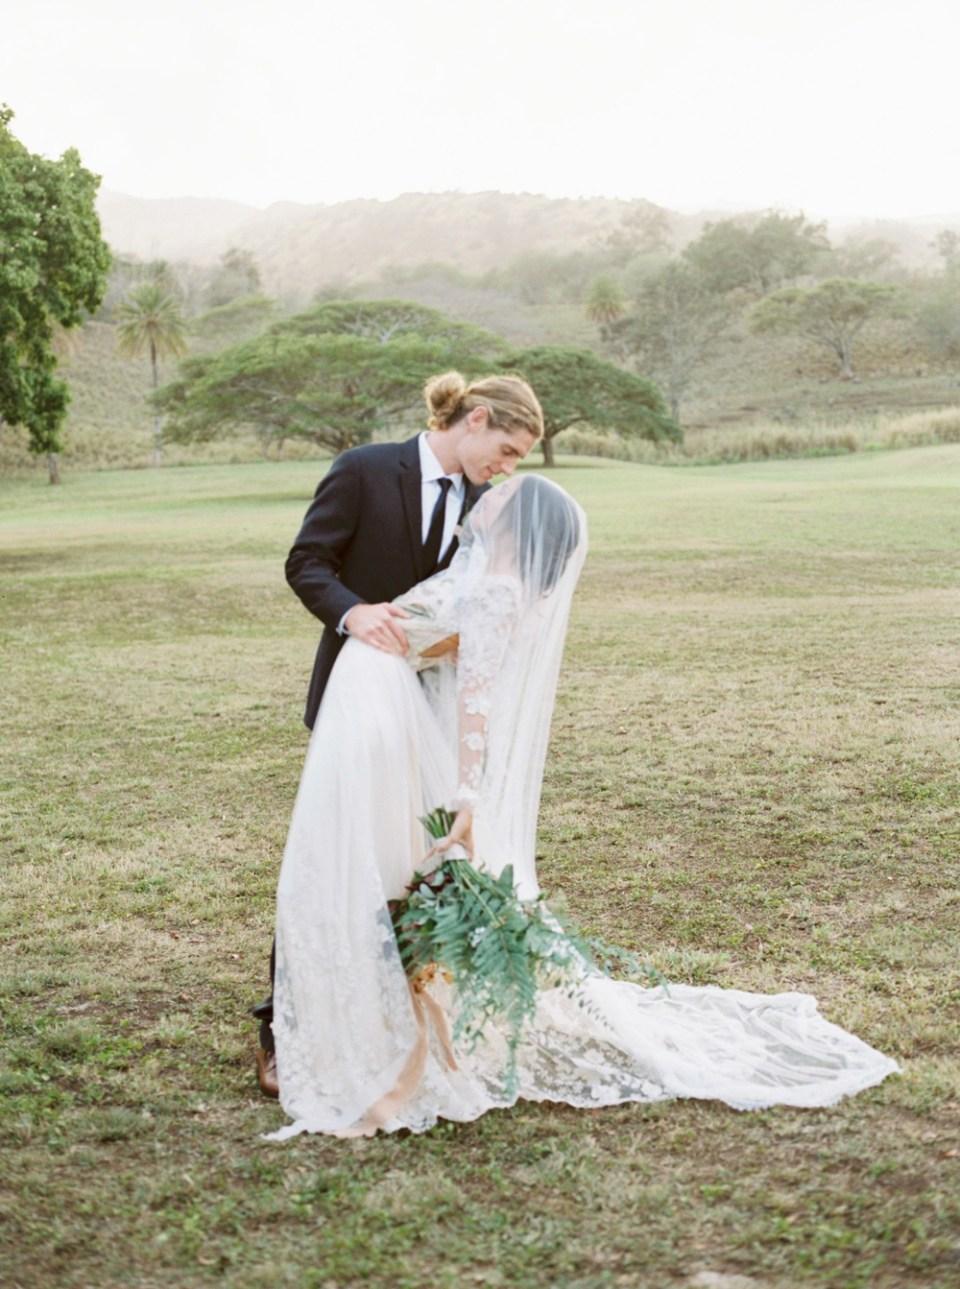 Dillingham Ranch Wedding Photographer